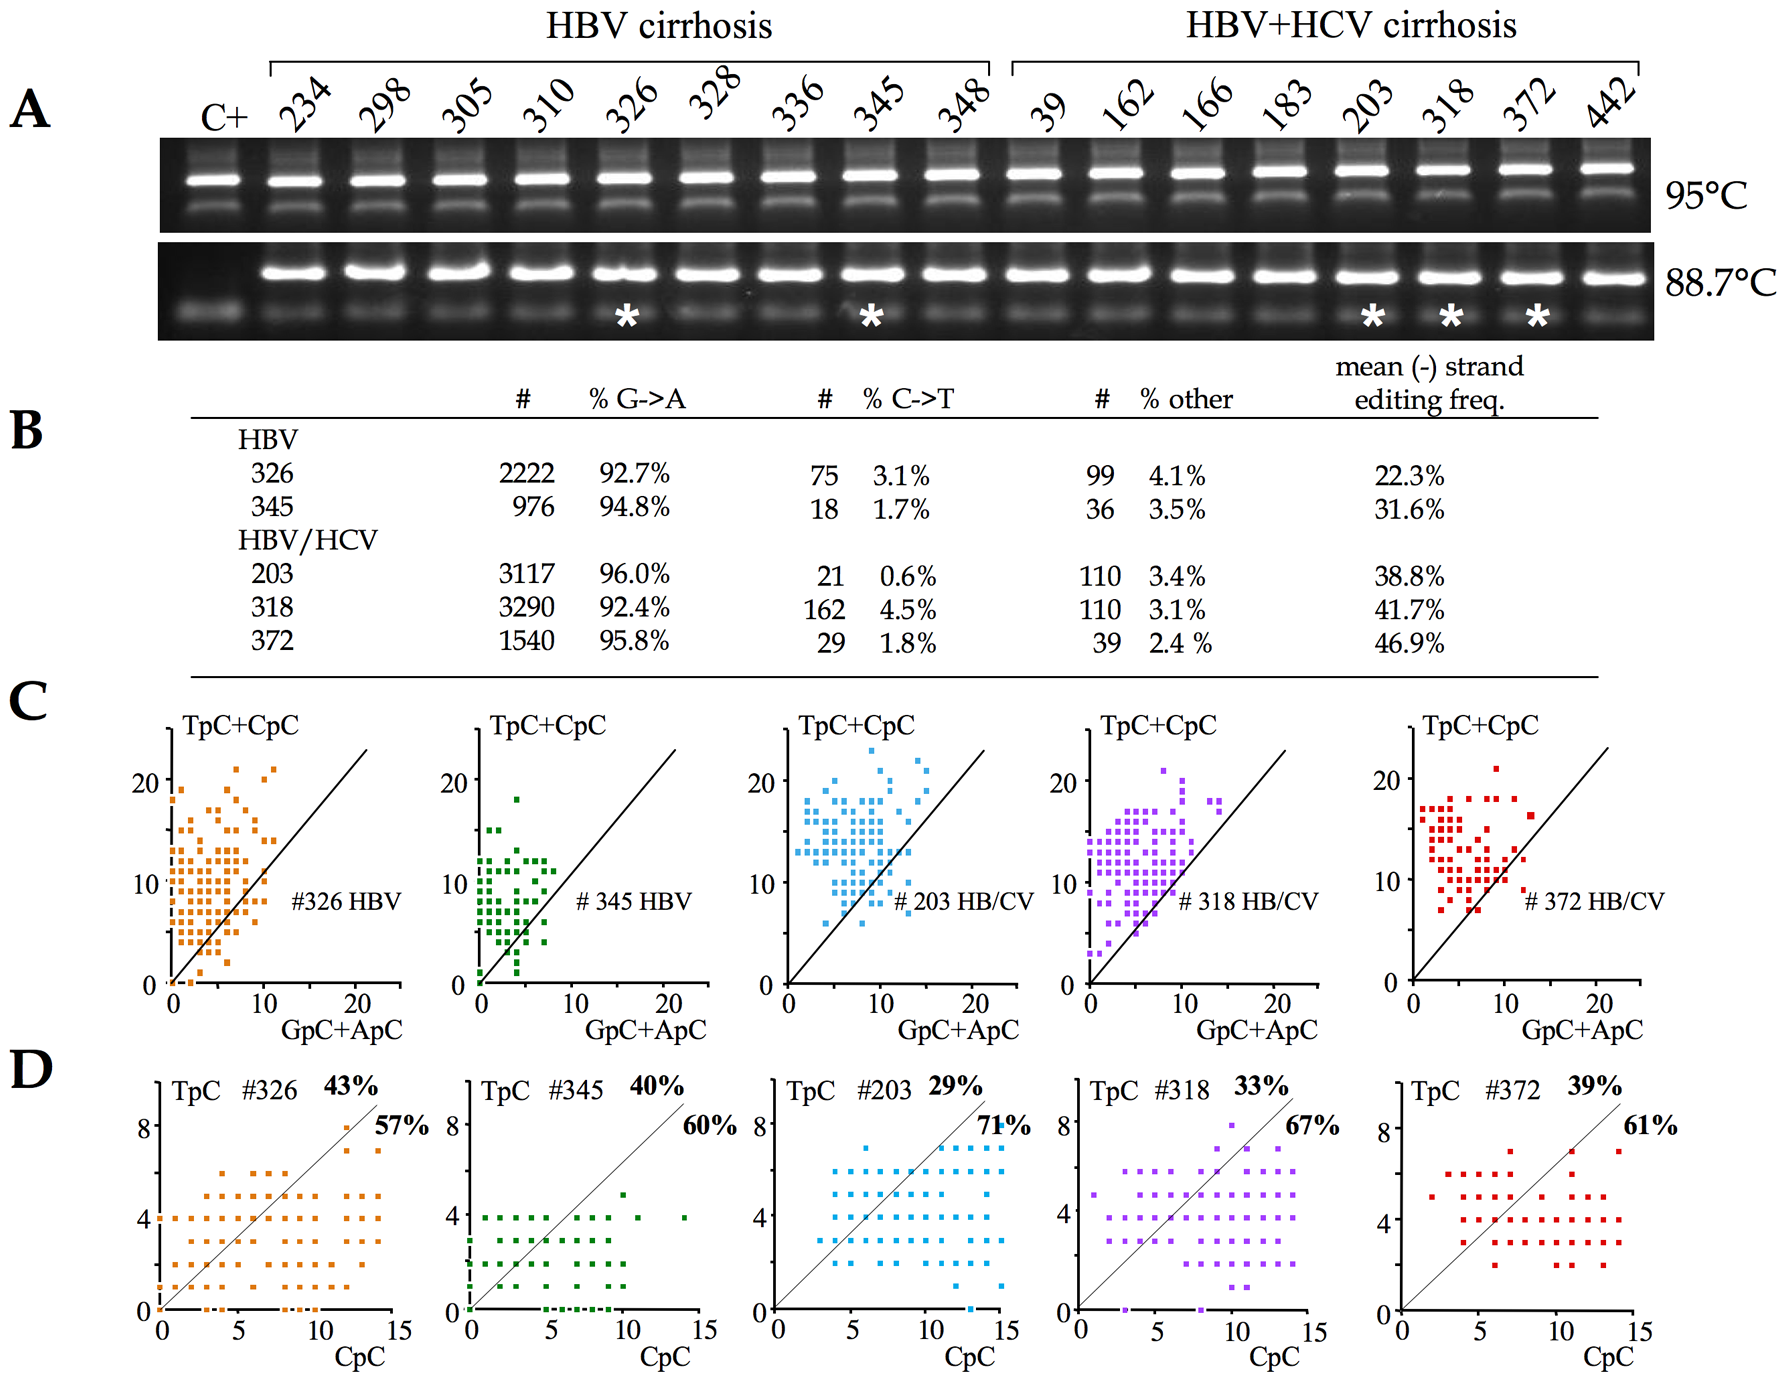 A3 deaminases are the major editors of HBV DNA <i>in vivo</i>.